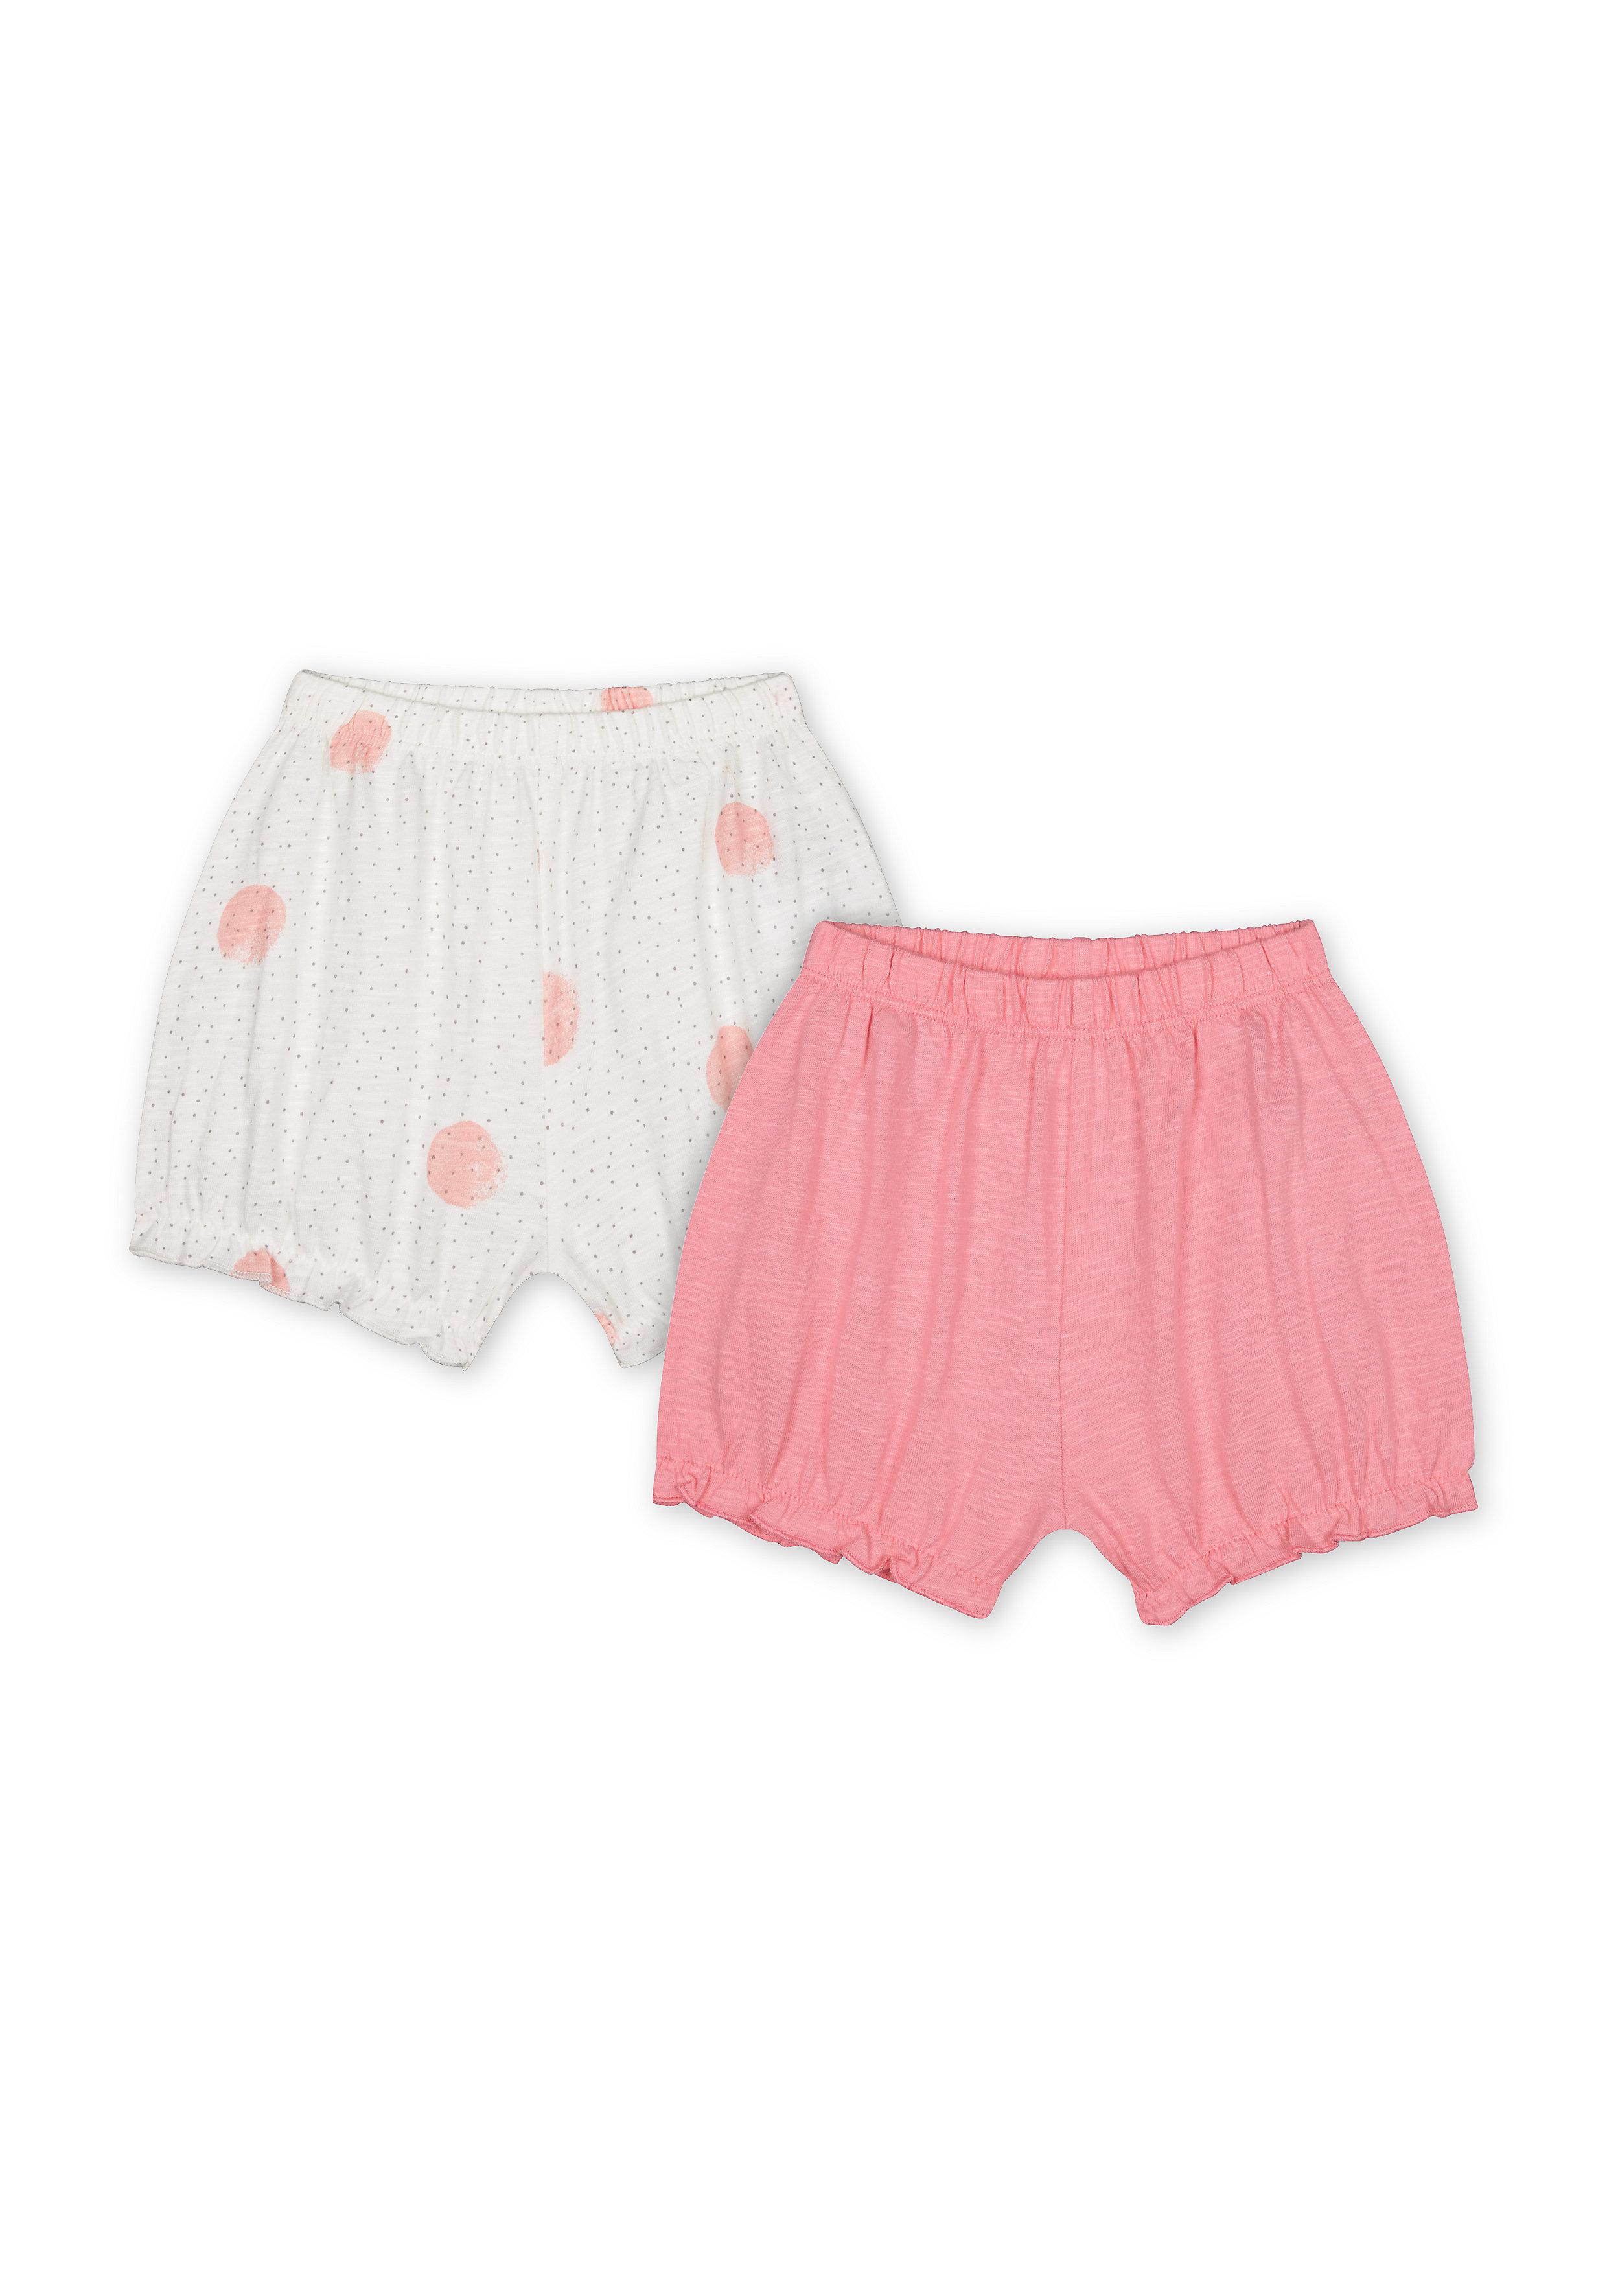 Mothercare | Girls Shorts Polka Dot Print - Pack Of 2 - Pink Cream